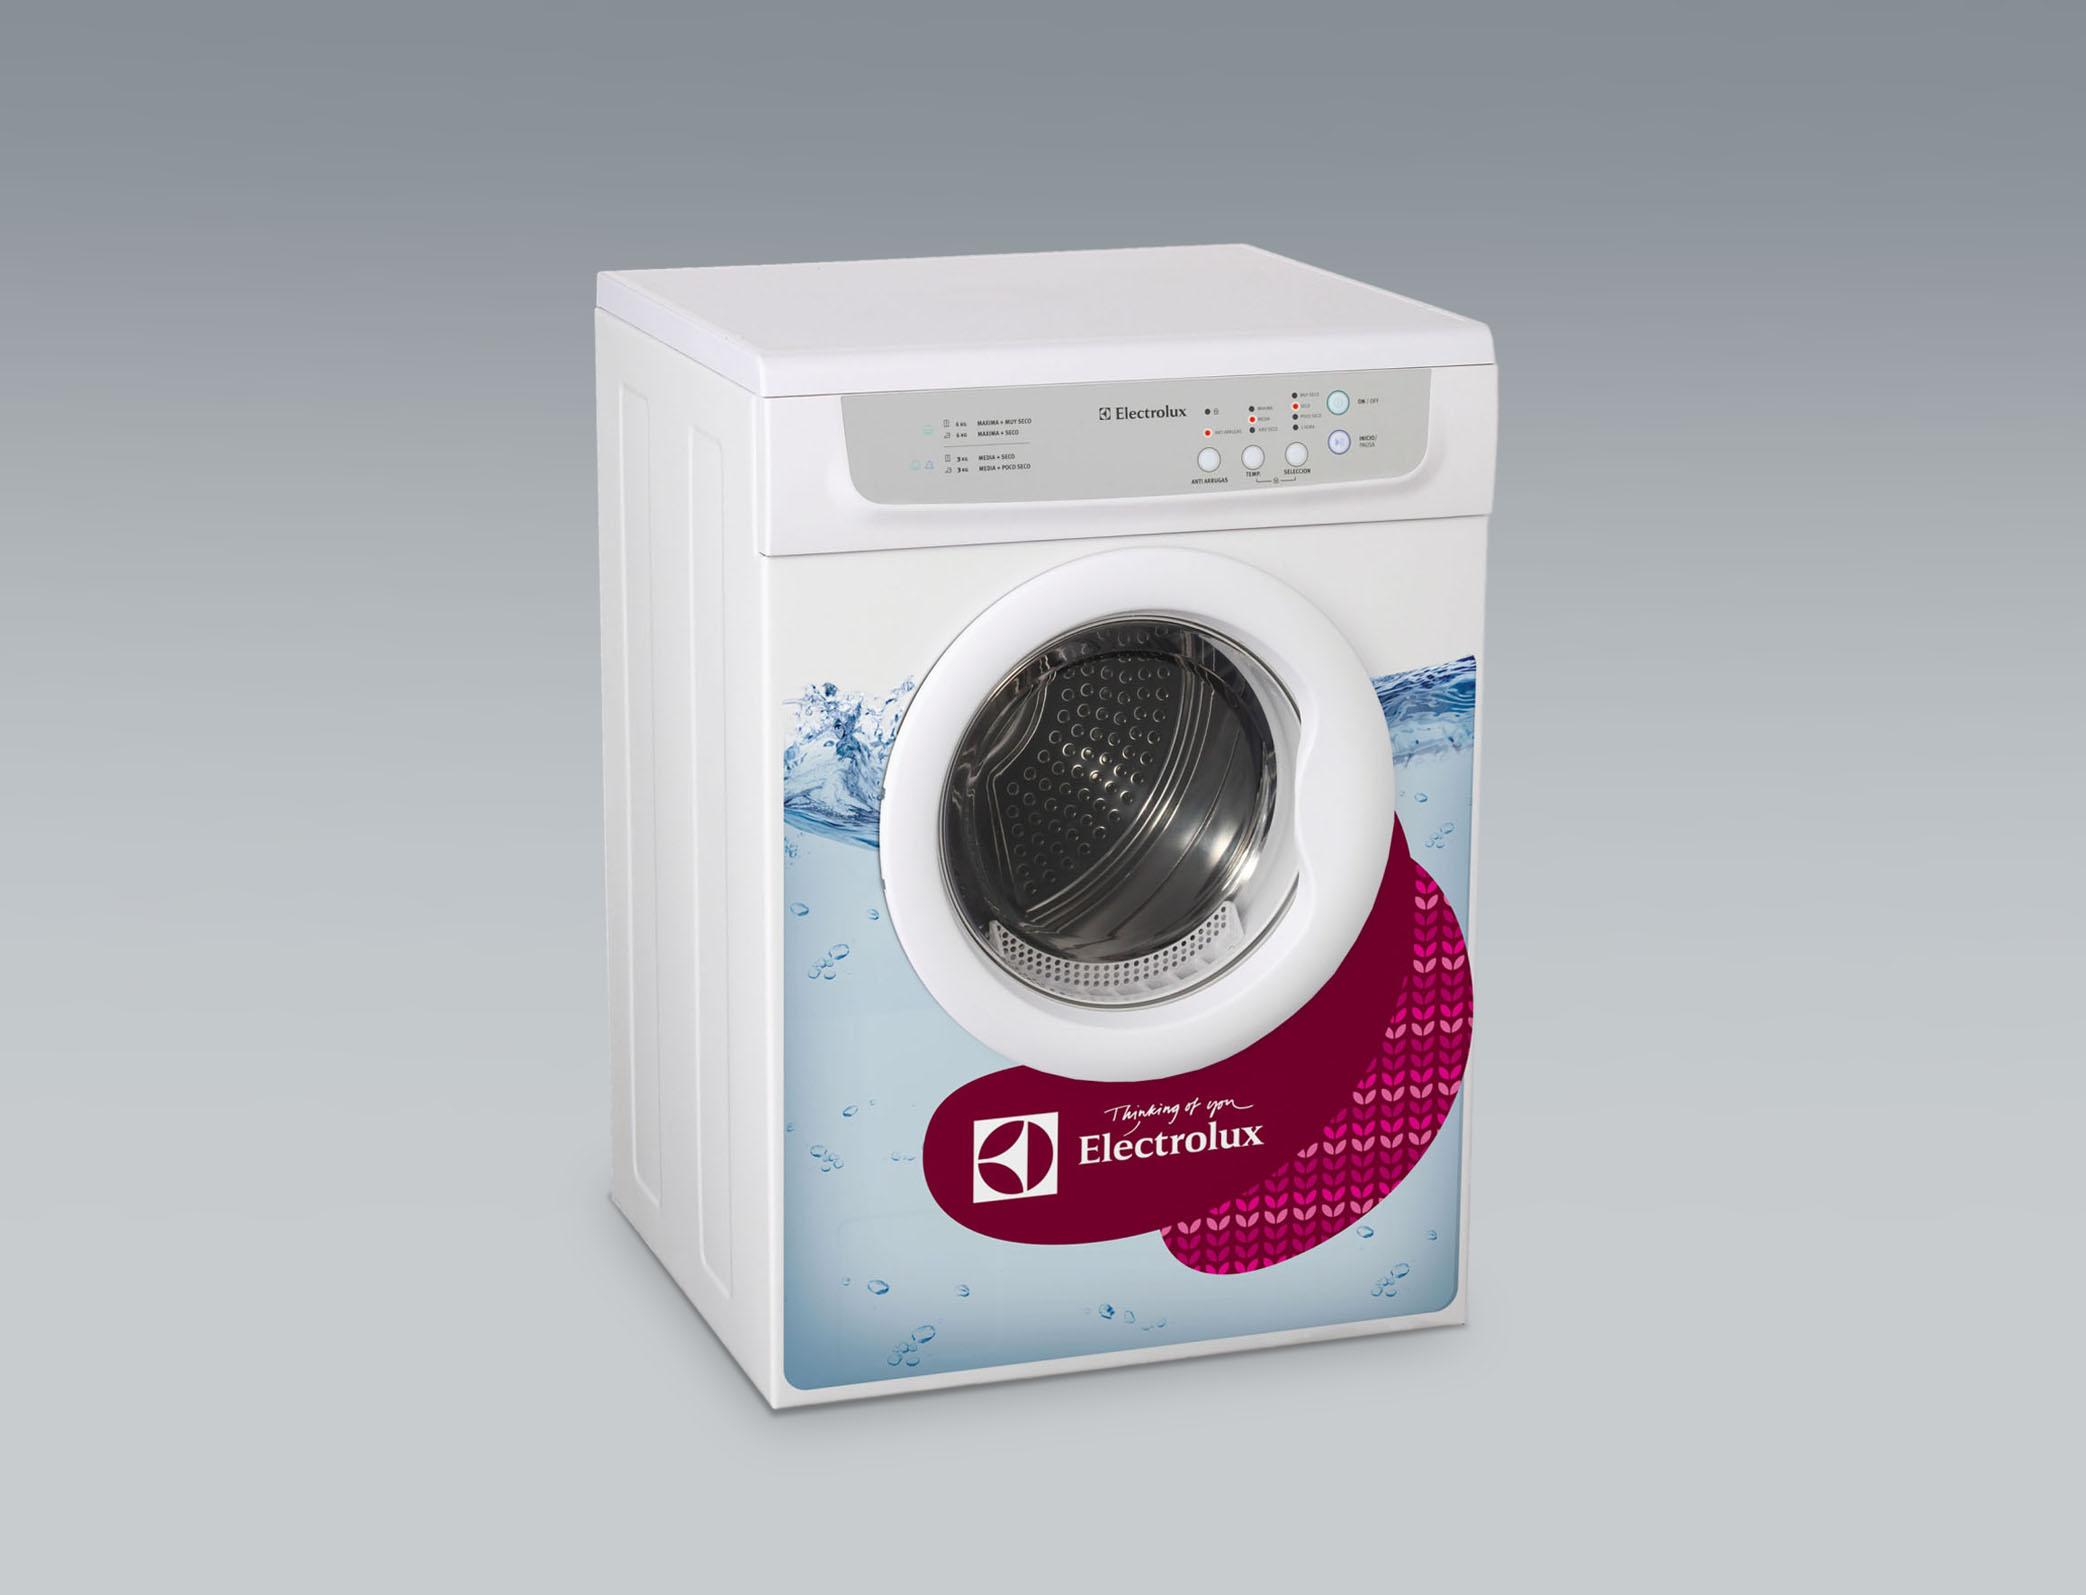 electrolux-adesivos-04b